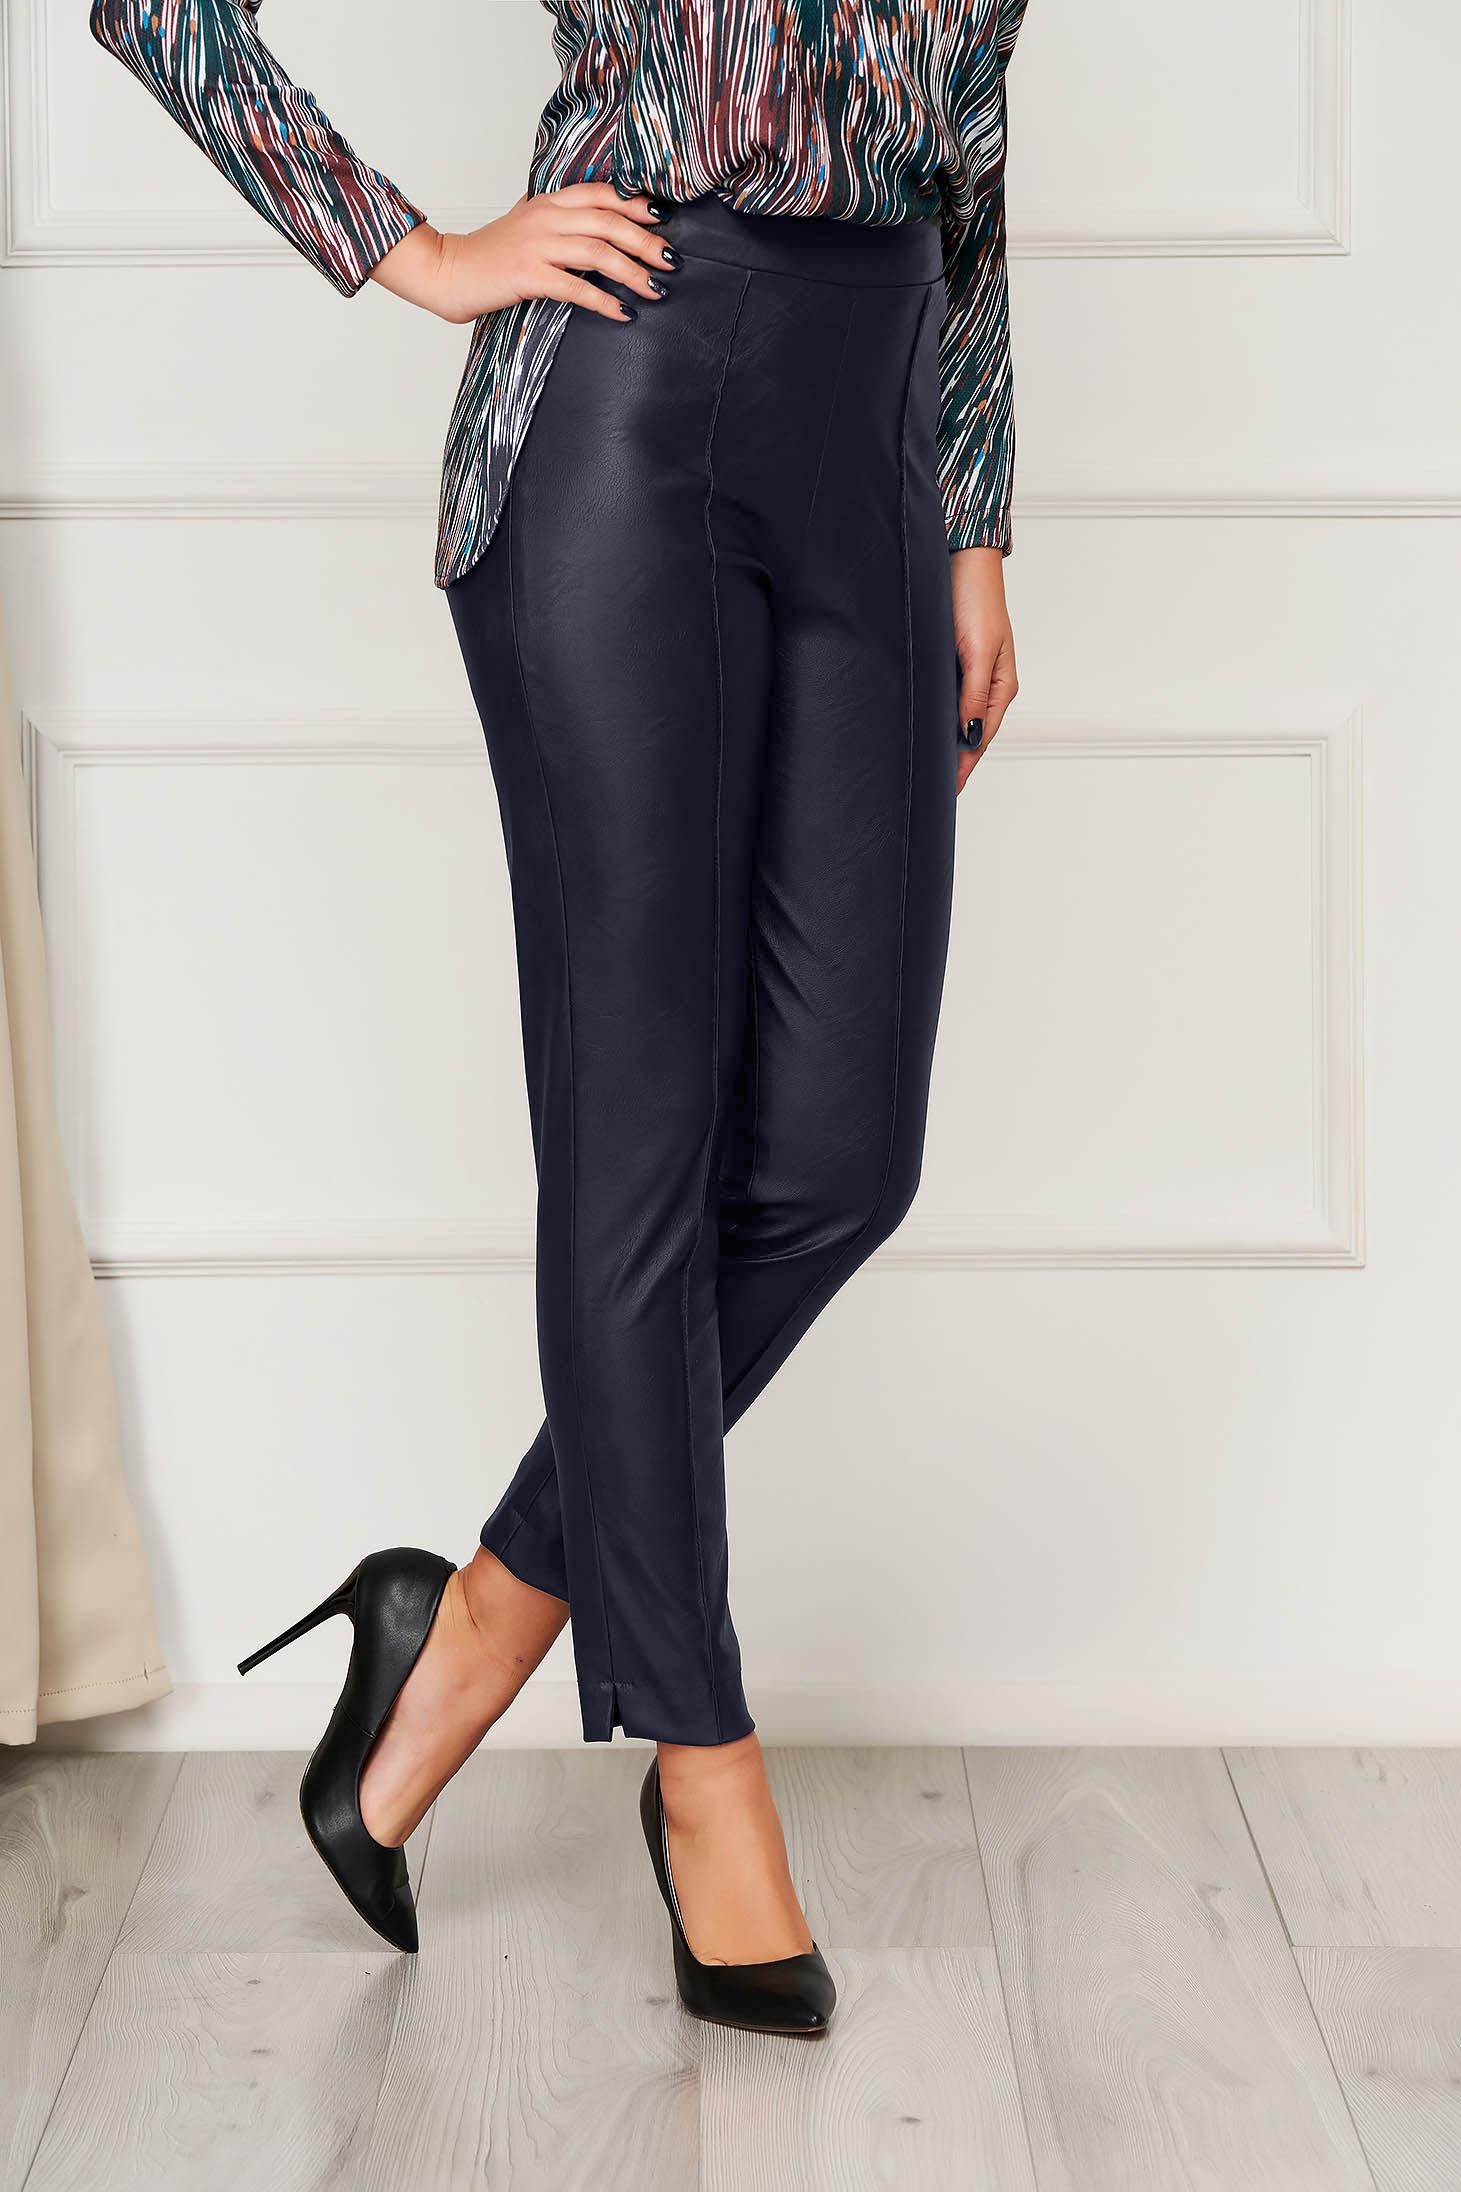 Pantaloni StarShinerS albastru-inchis casual din piele ecologica cu un croi mulat cu talie inalta